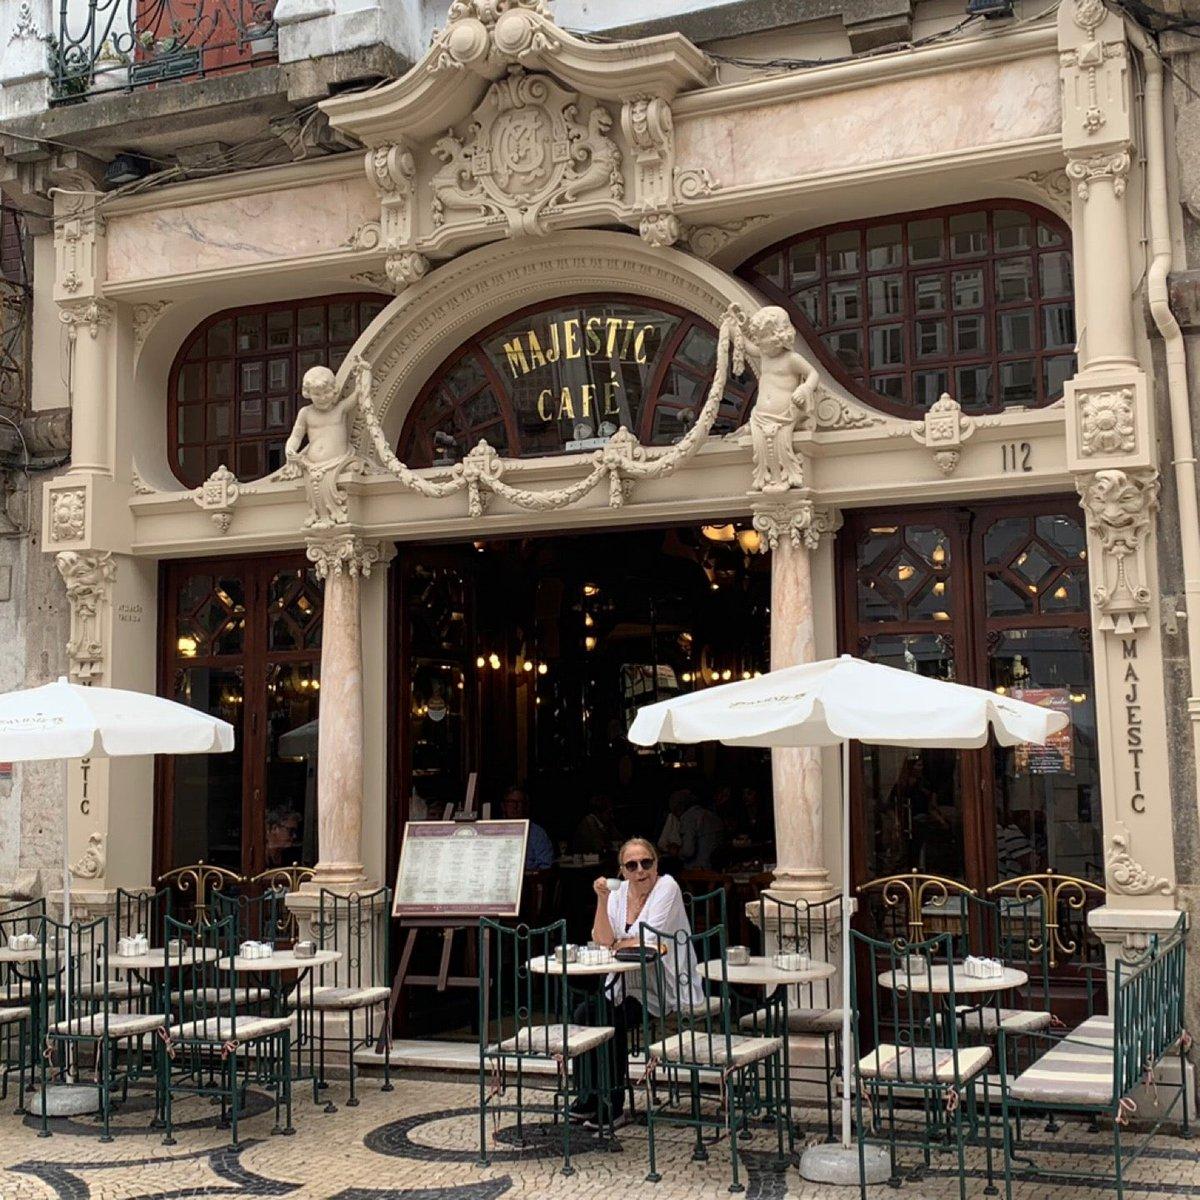 test ツイッターメディア - 1921年創業、ポルトで1番美しいと言われるカフェ。 (@ Majestic Café in Porto) https://t.co/AYZwiezkQK https://t.co/bEvnysO3Yv